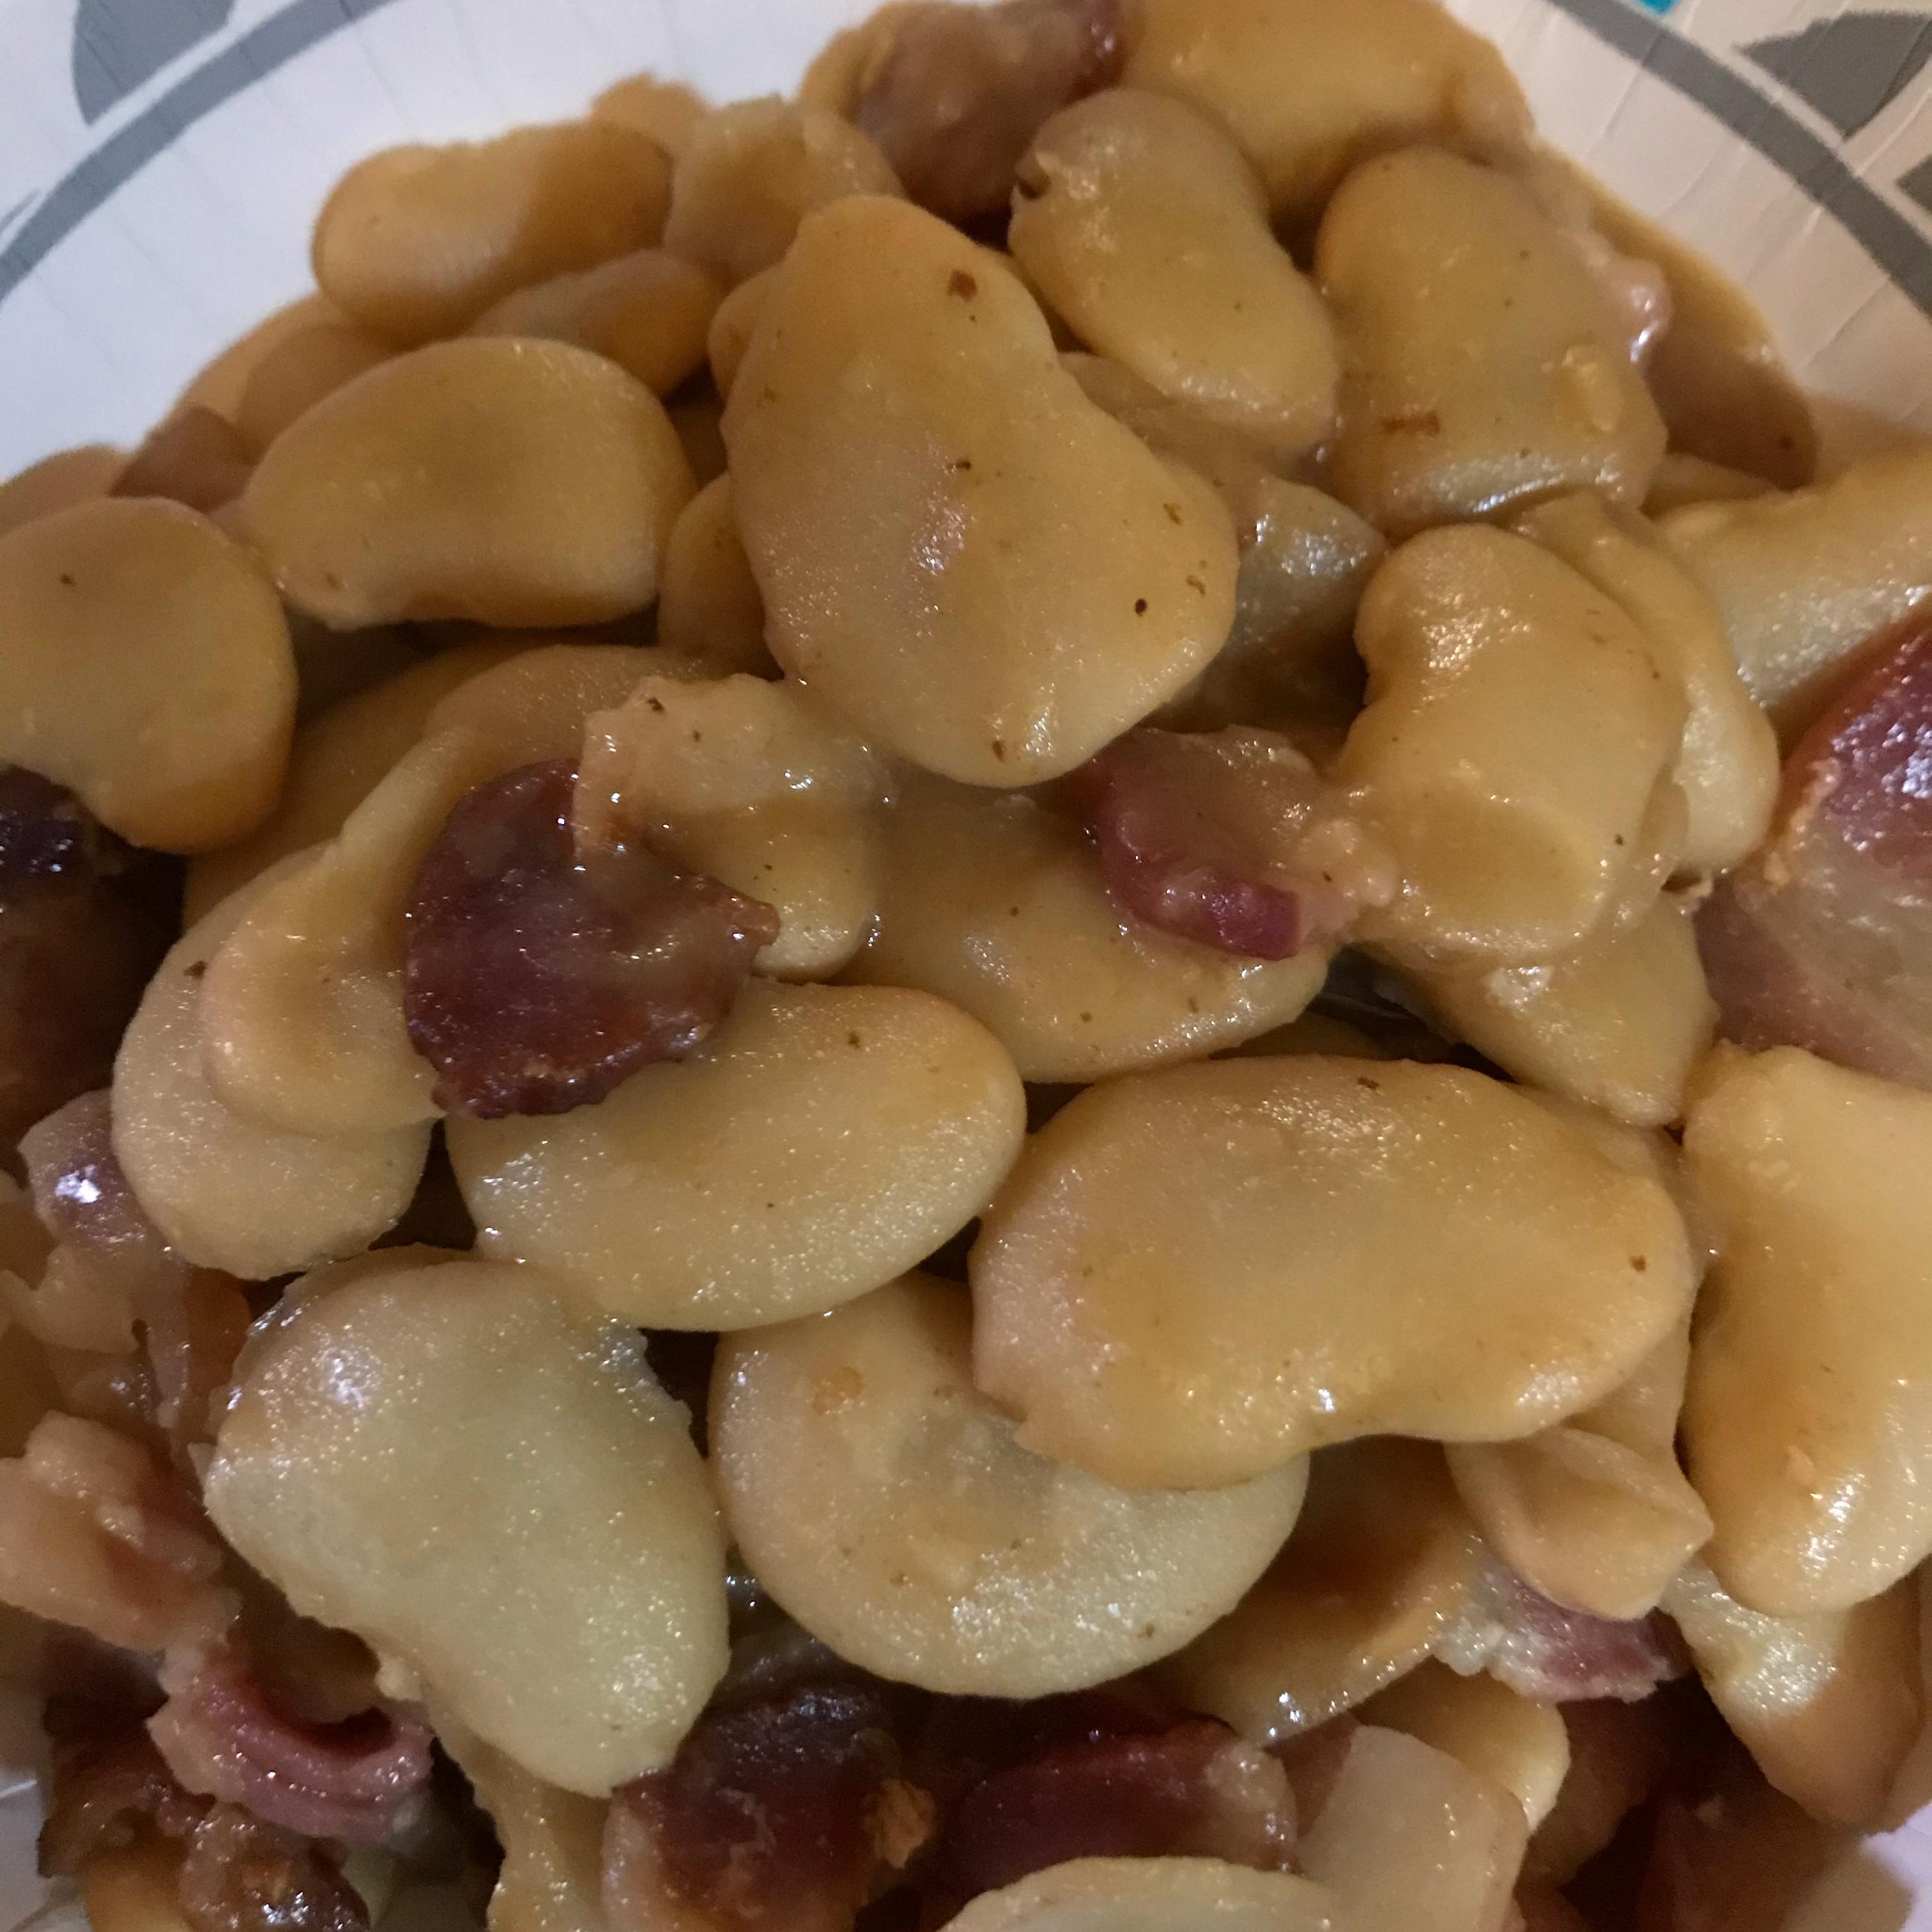 Nancy's Butter Beans marvy1